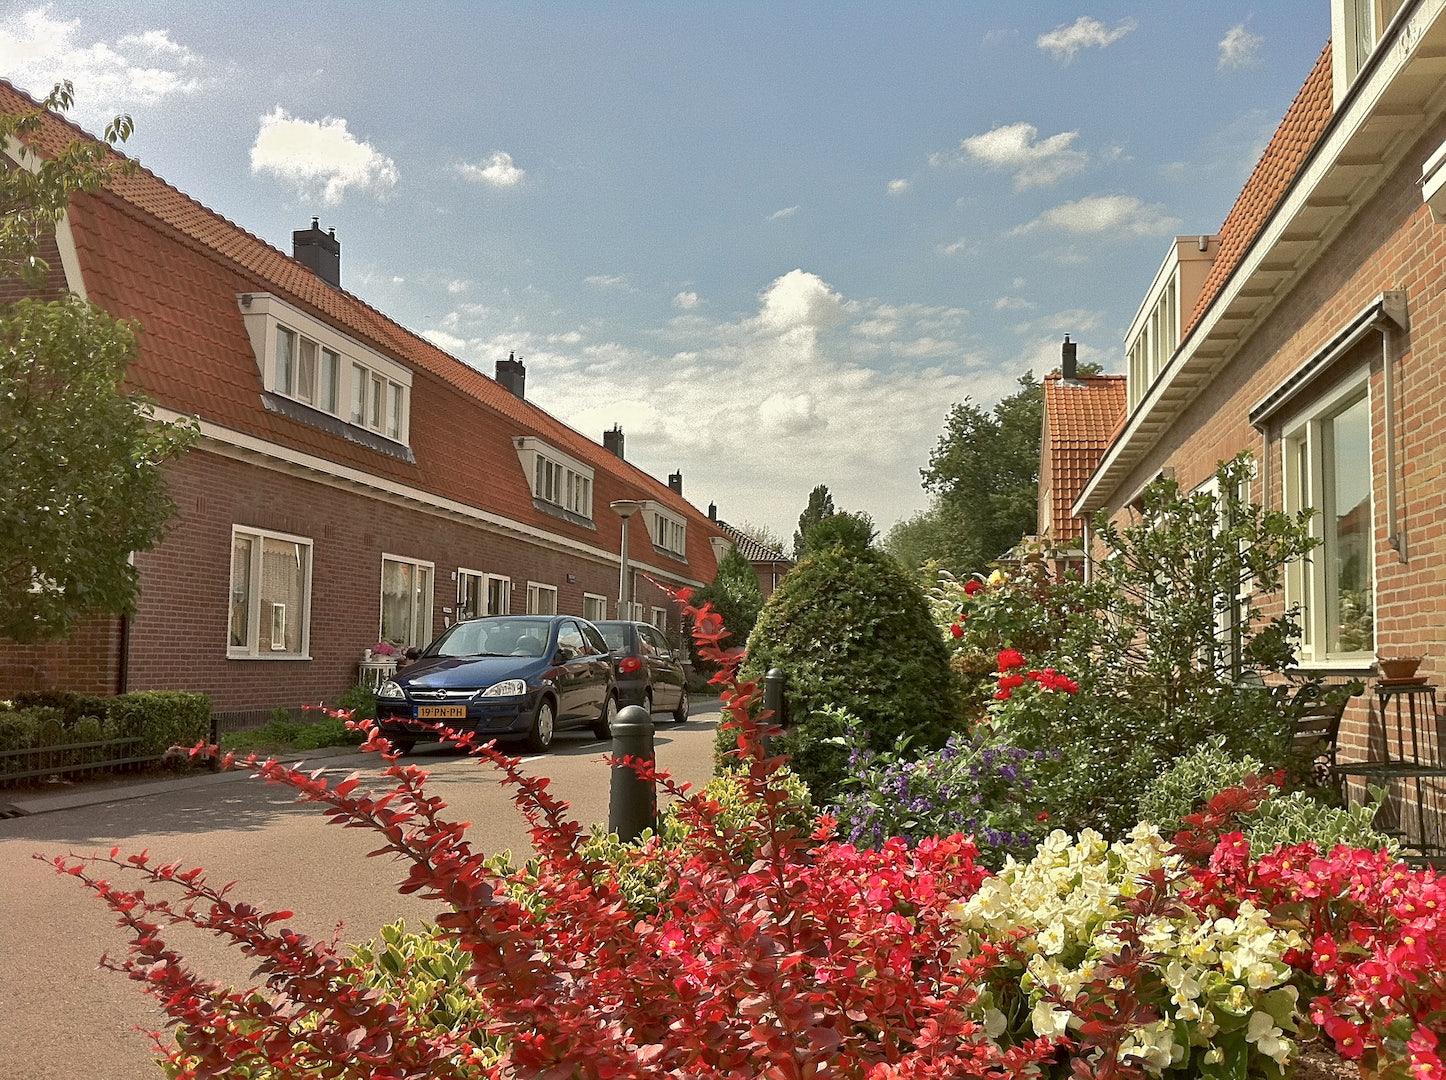 Amsterdam - Tuindorp Oostzaan